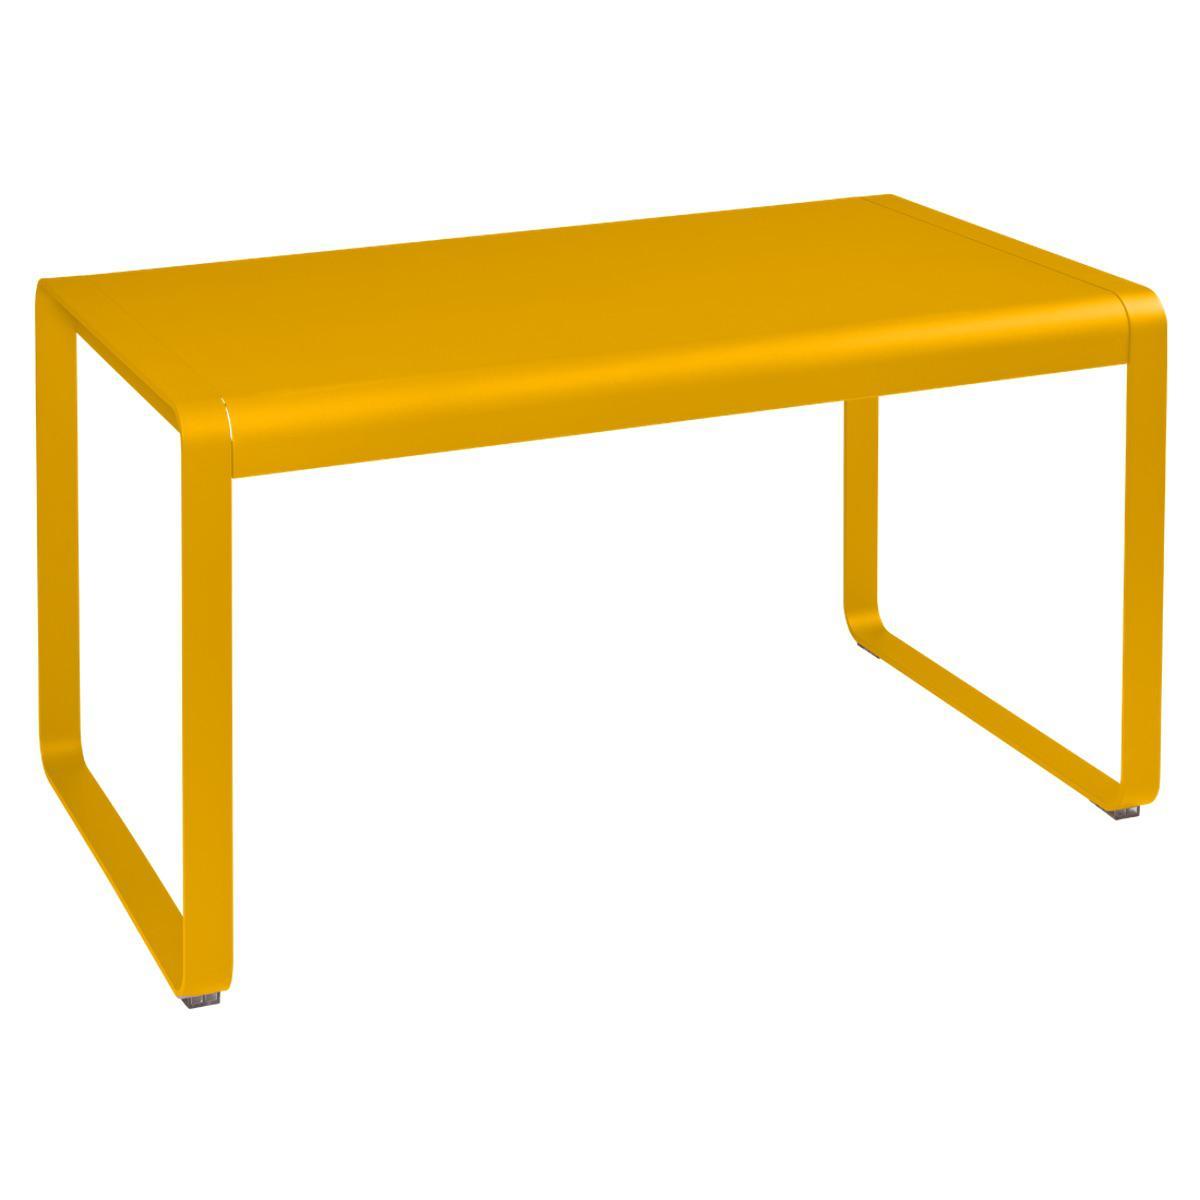 Table de jardin 80x140cm BELLEVIE Fermob miel